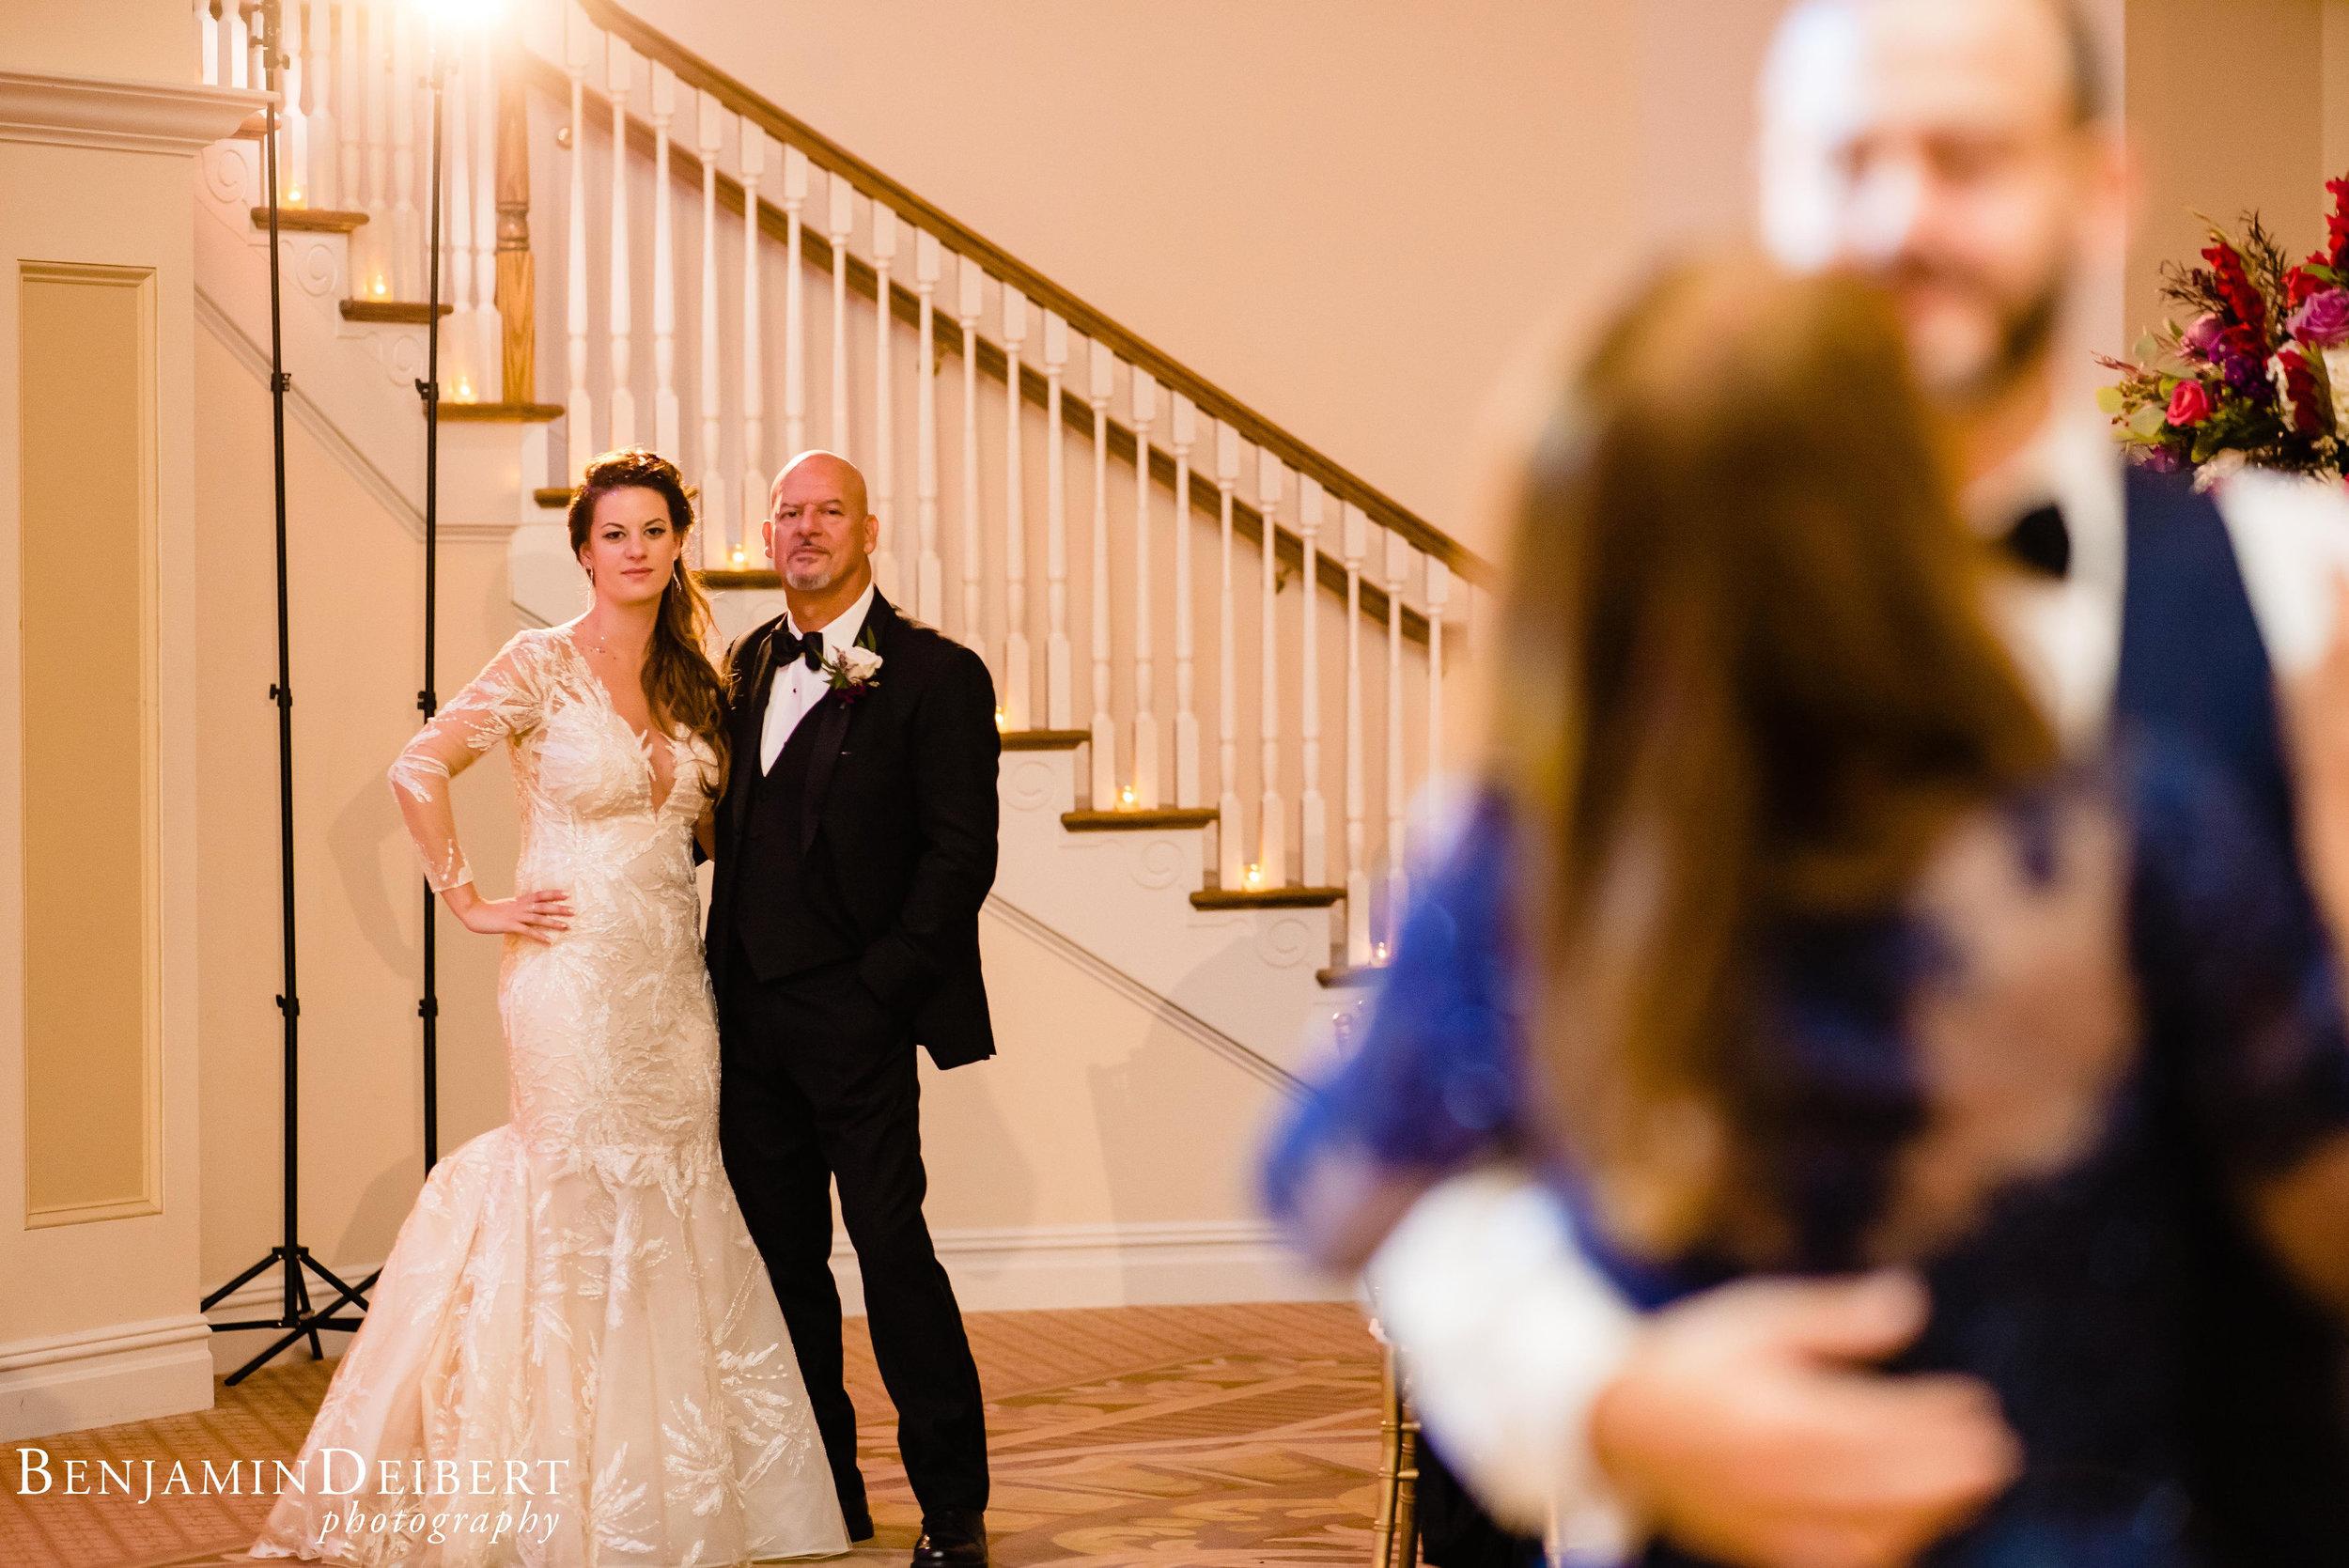 AmandaandElliott_TheCarriageHouse_Wedding-58.jpg